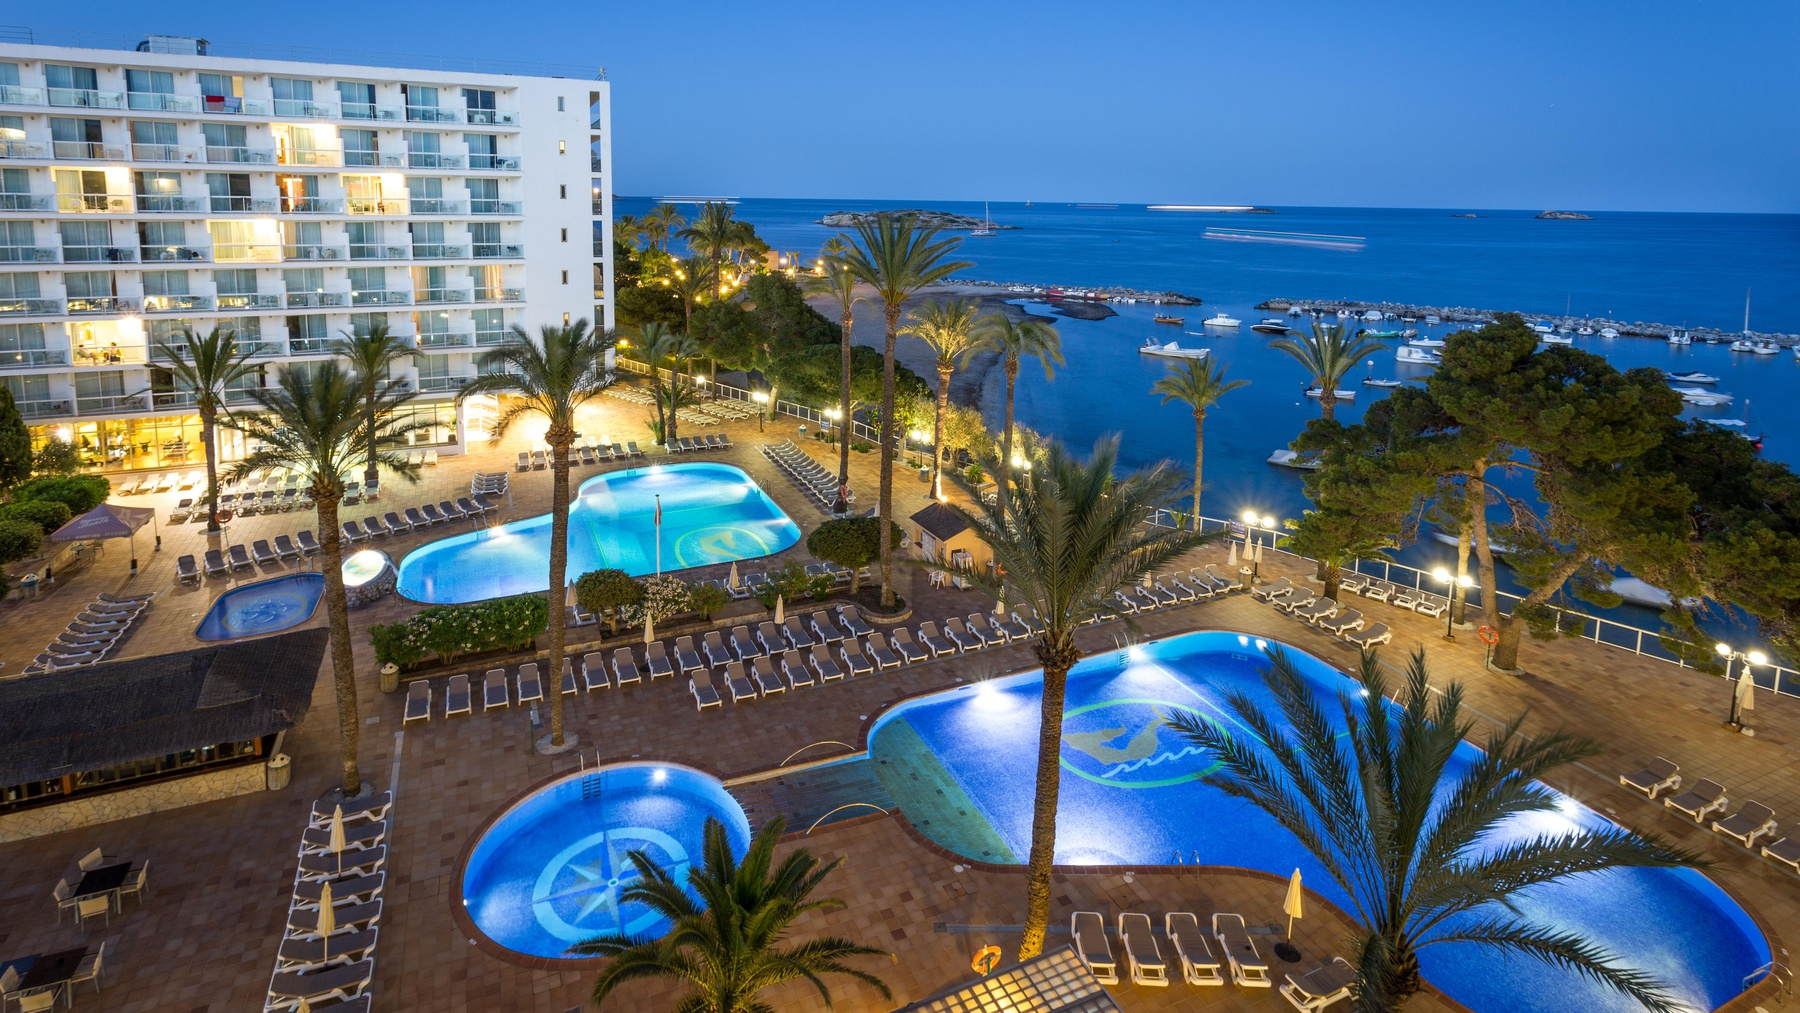 Sirene Beach Hotel Tui